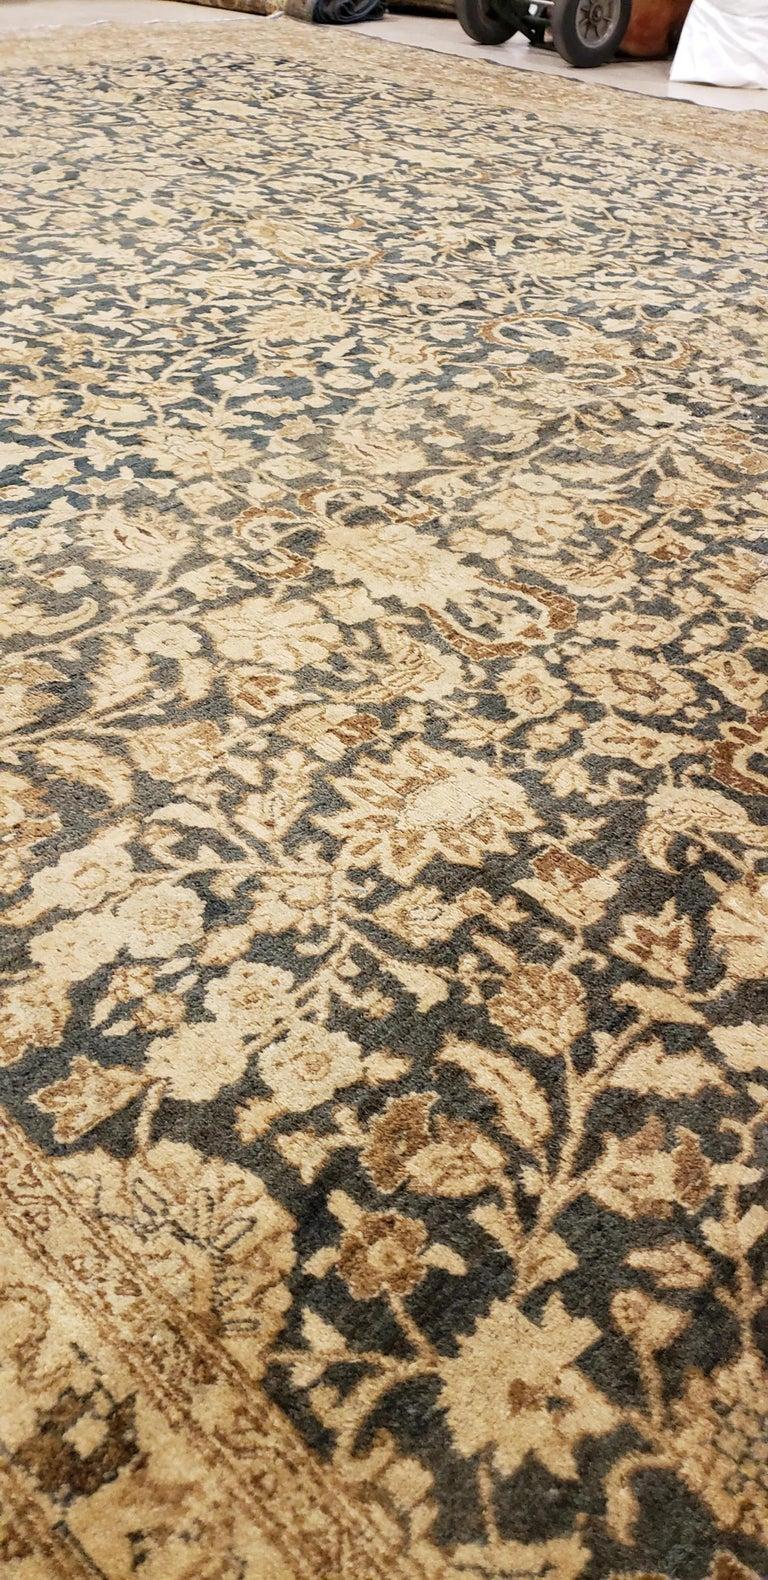 Antique Persian Tabriz Carpet, Handmade Oriental Rug, Beige, Gray/Blue, Taupe For Sale 2